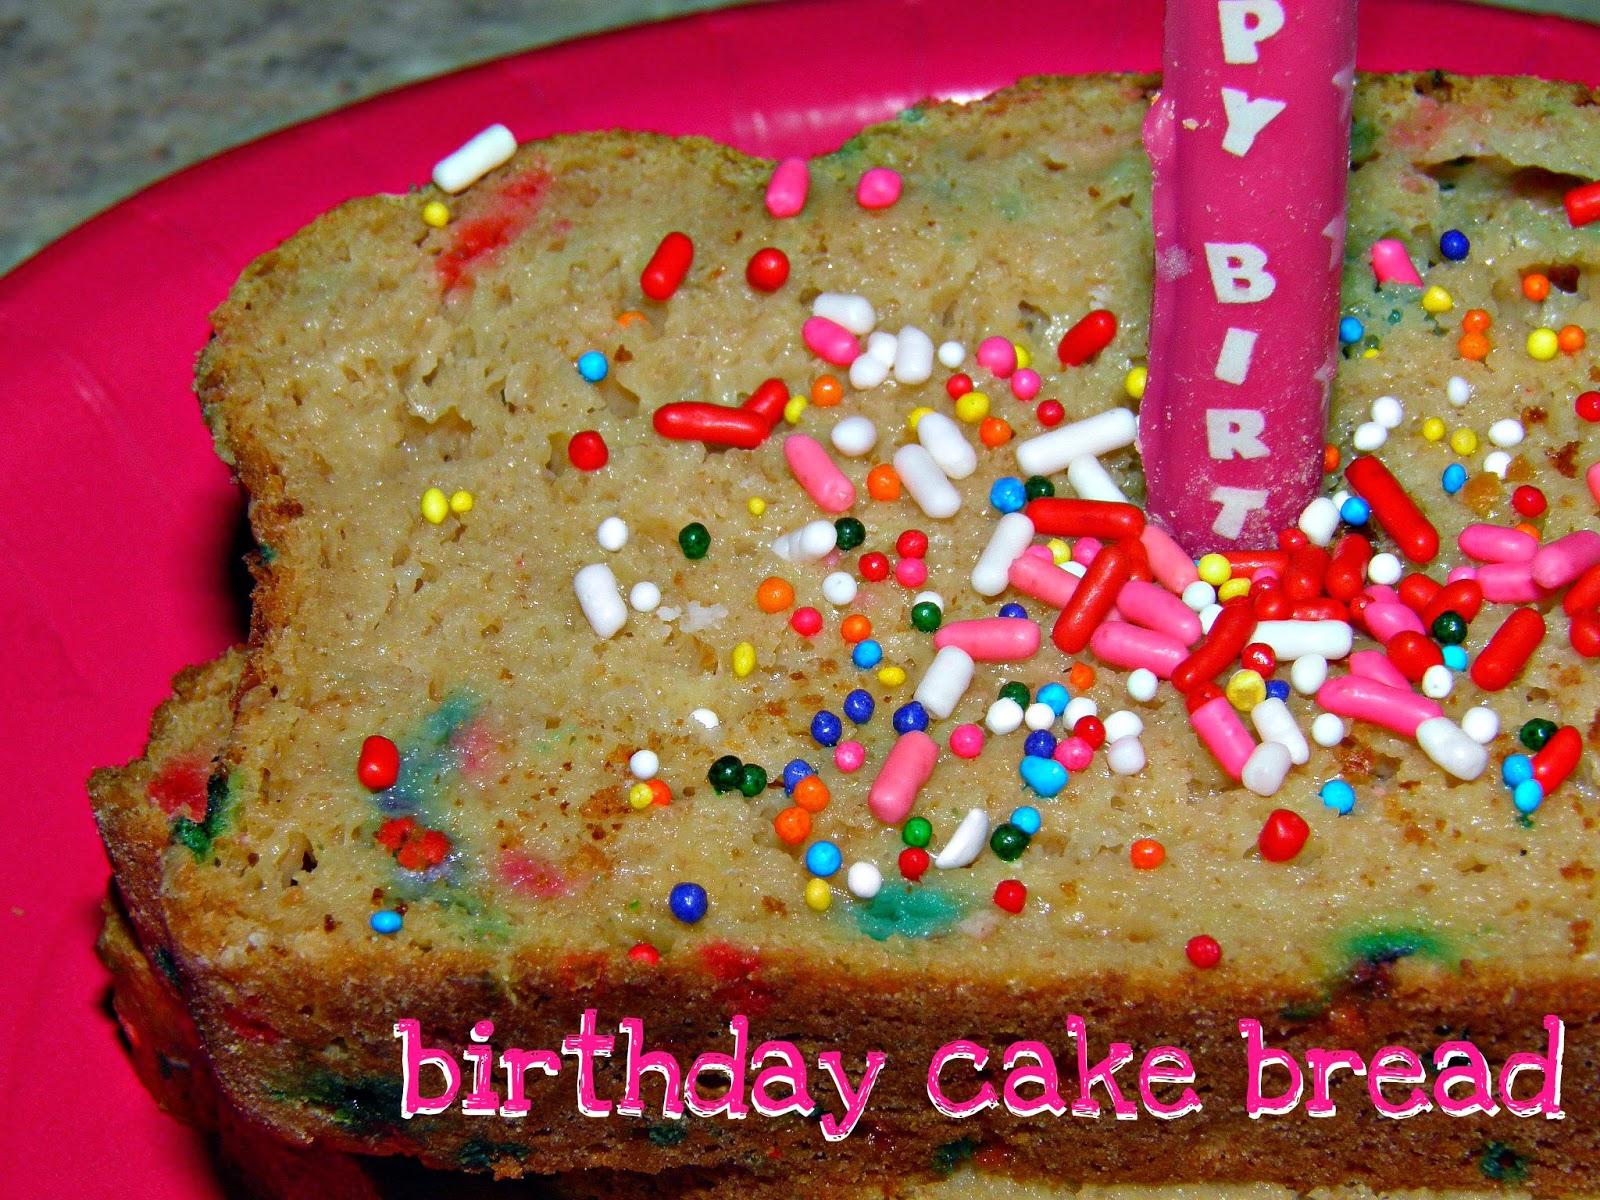 Bliss Birthday Cake Bread